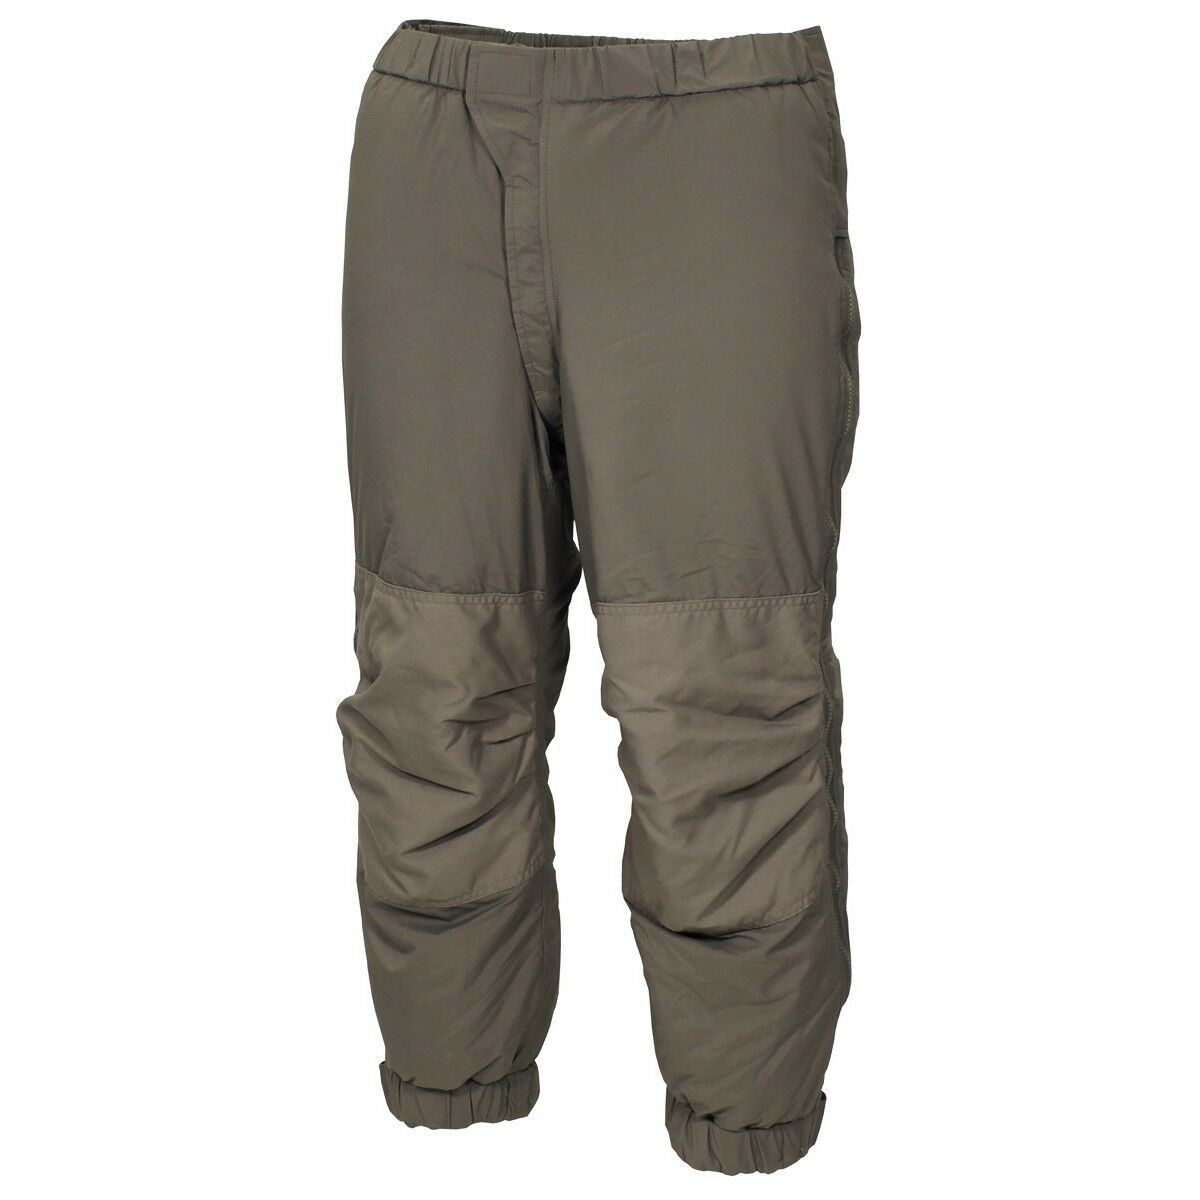 US ARMY Gen III ECWCS Level 7 Kälteschutzhose Winter Hose pants LR Large Regular  | Elegant